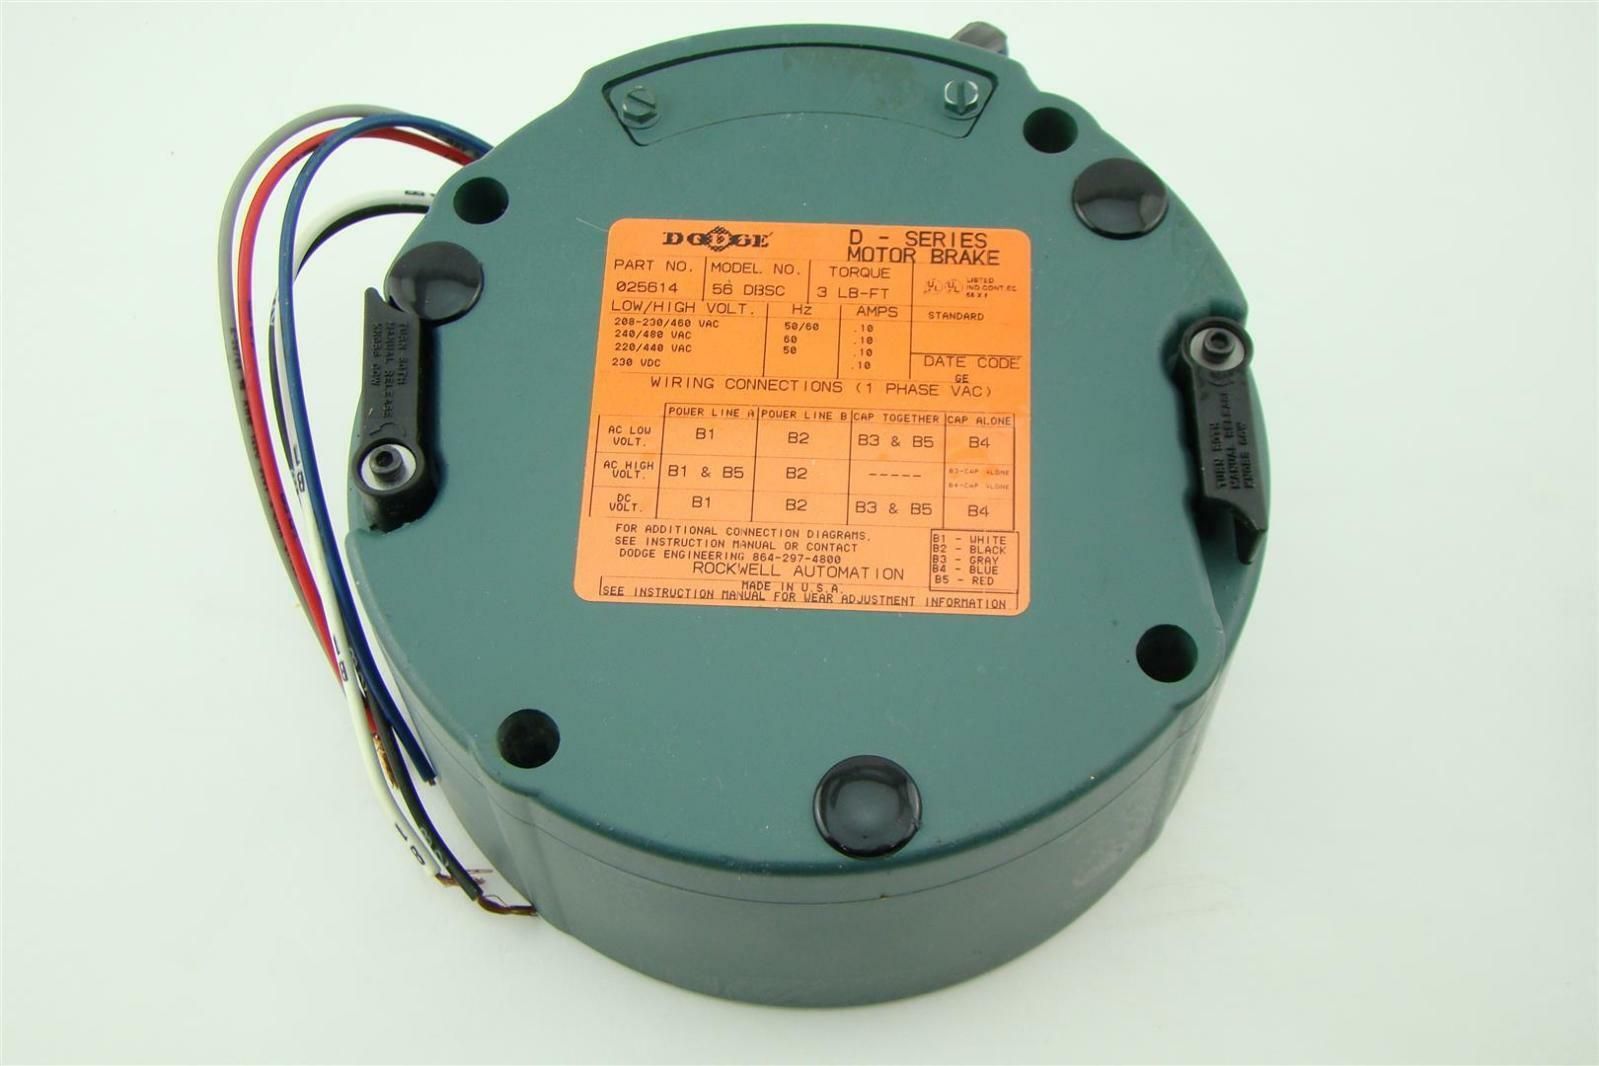 hight resolution of dodge d series motor brake 025614